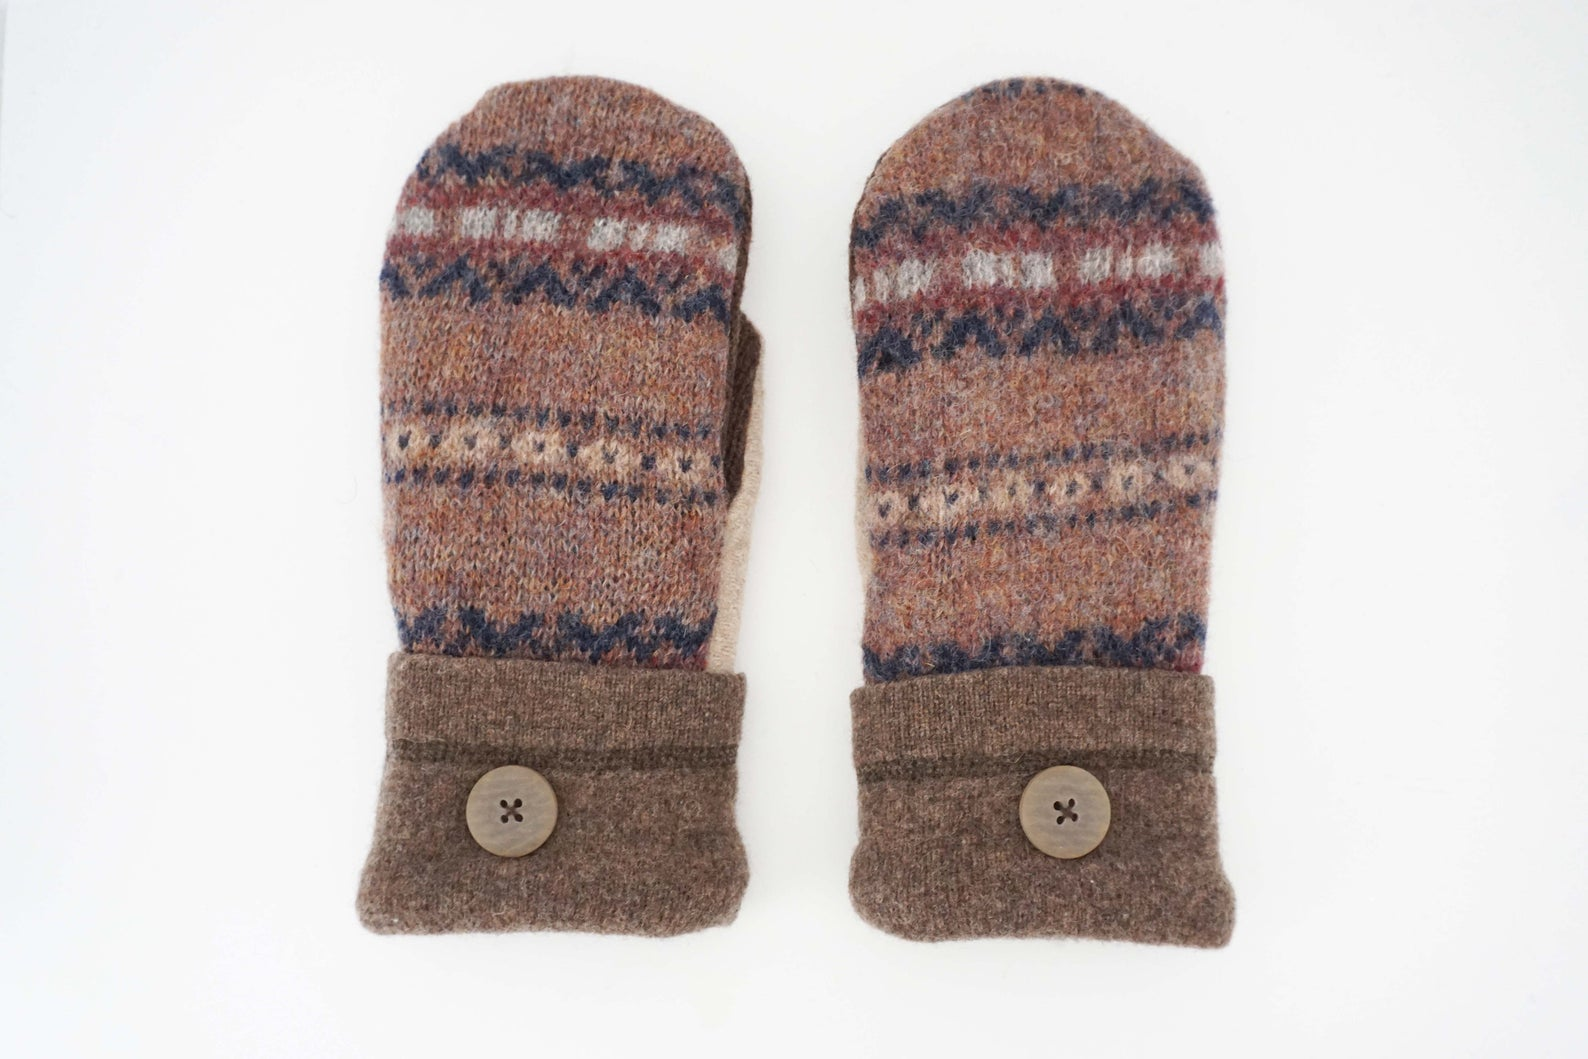 one stitch away mittens.jpg